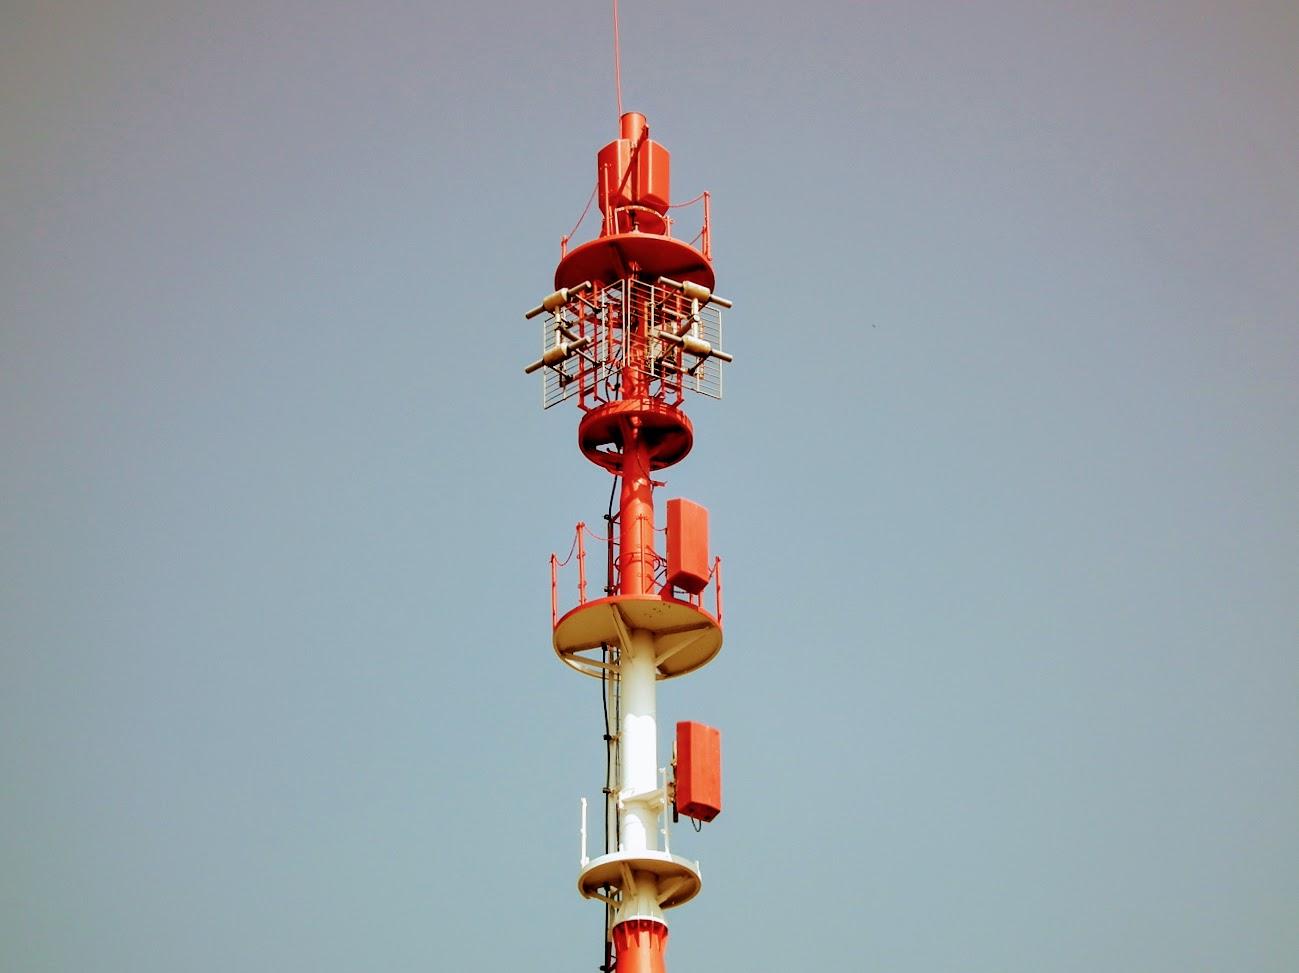 Bonyhád - DVB-T gapfiller